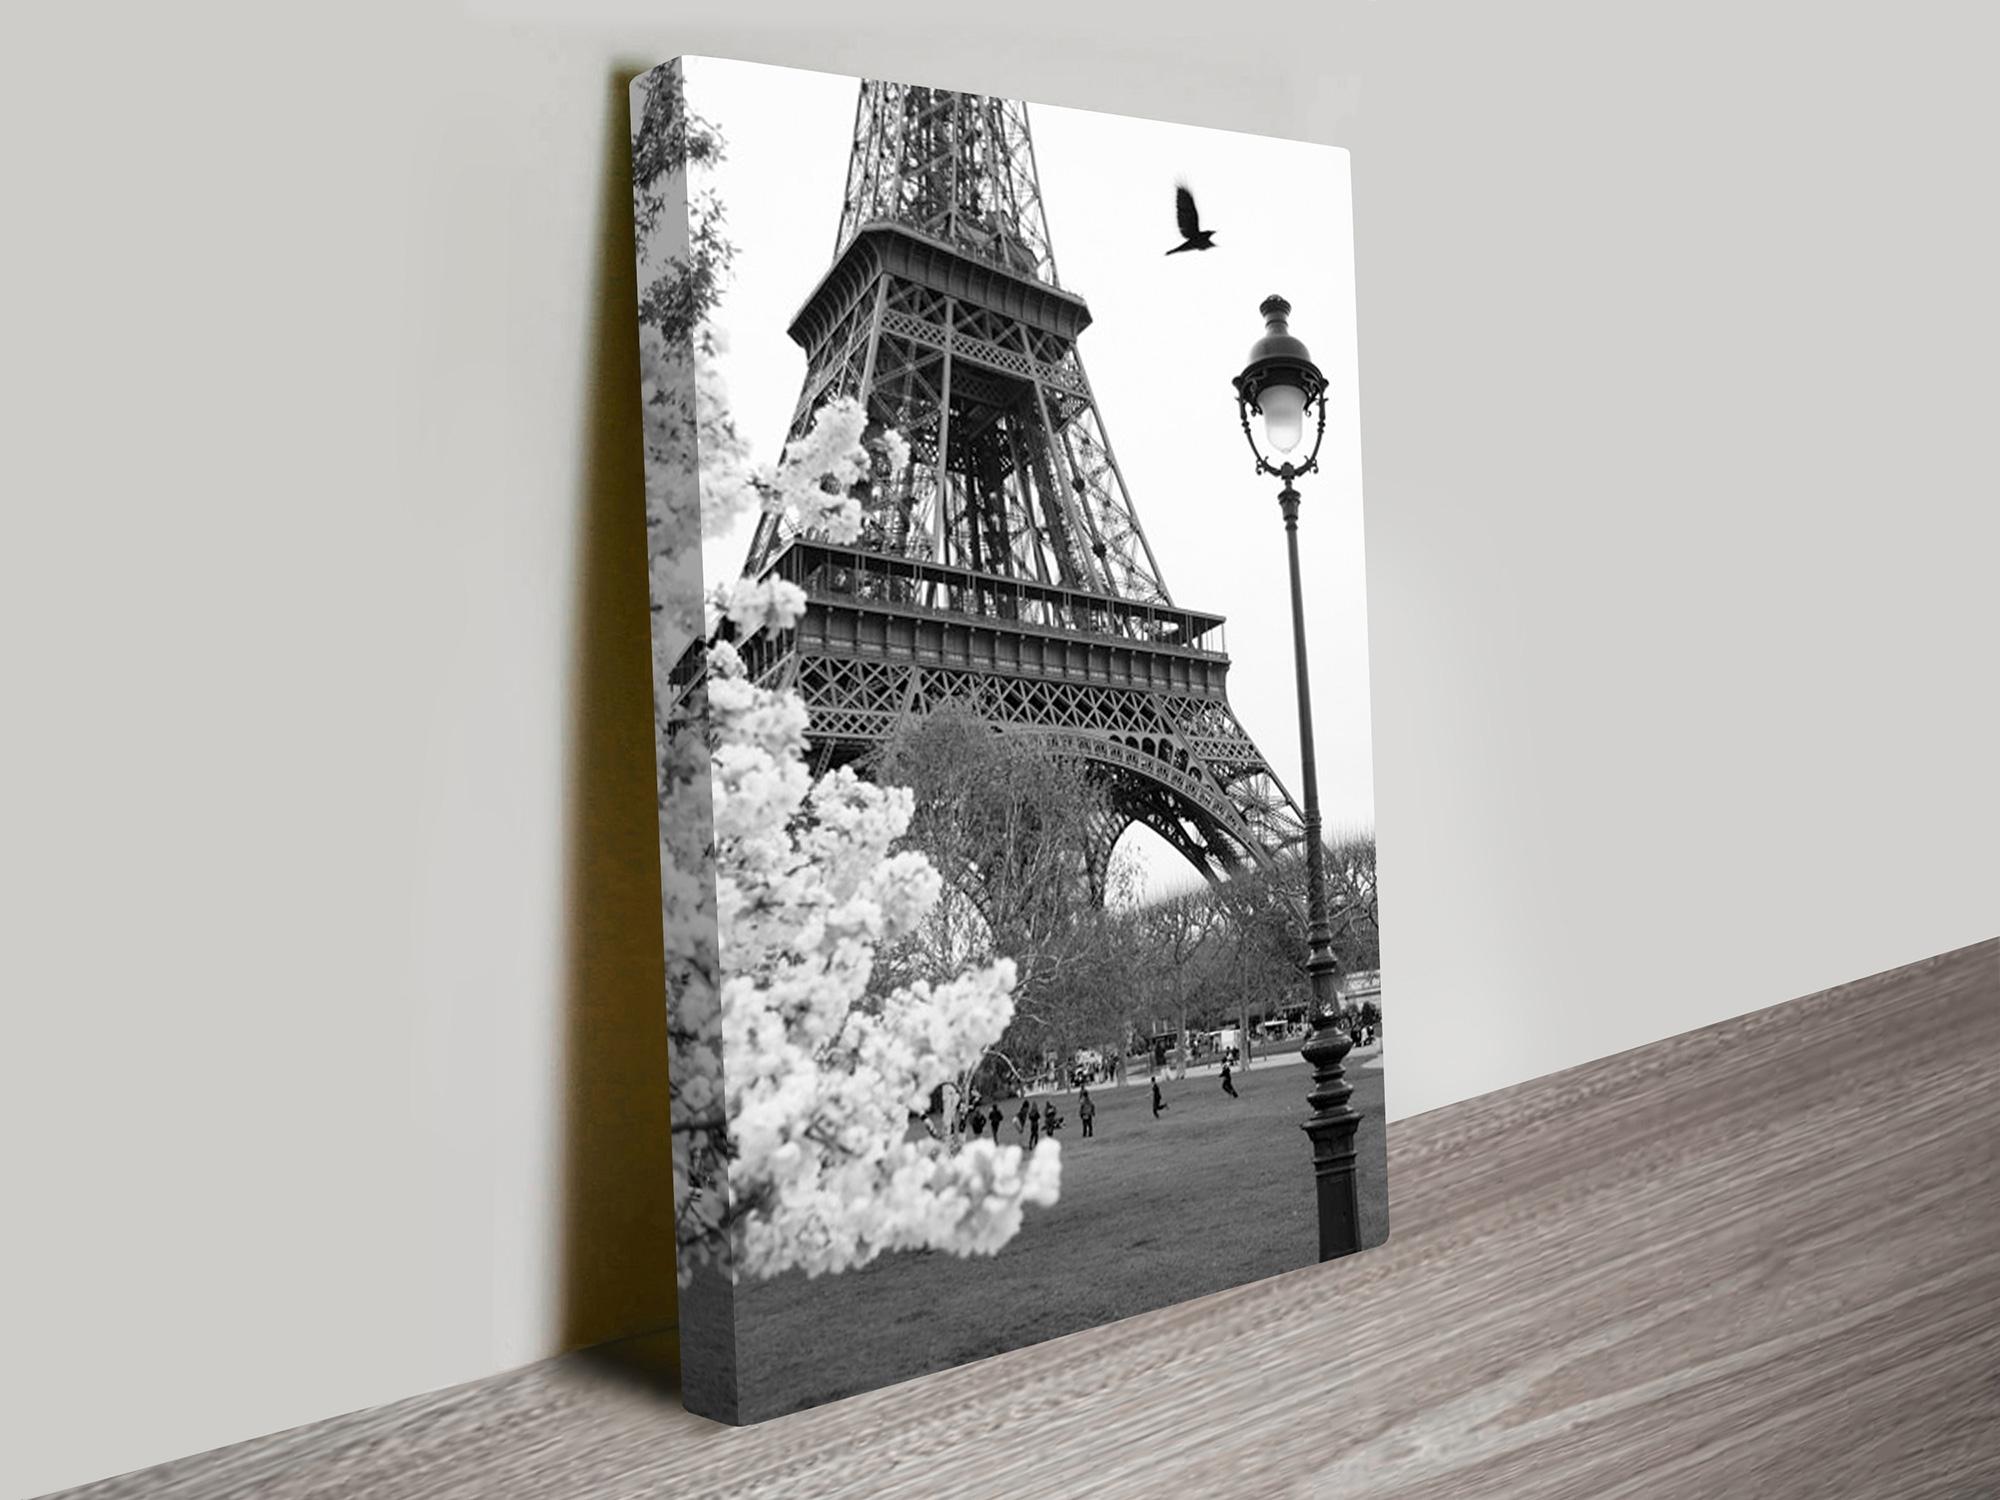 Eiffel Tower Portrait Canvas Artwork Regarding Most Up To Date Eiffel Tower Wall Art (View 4 of 15)